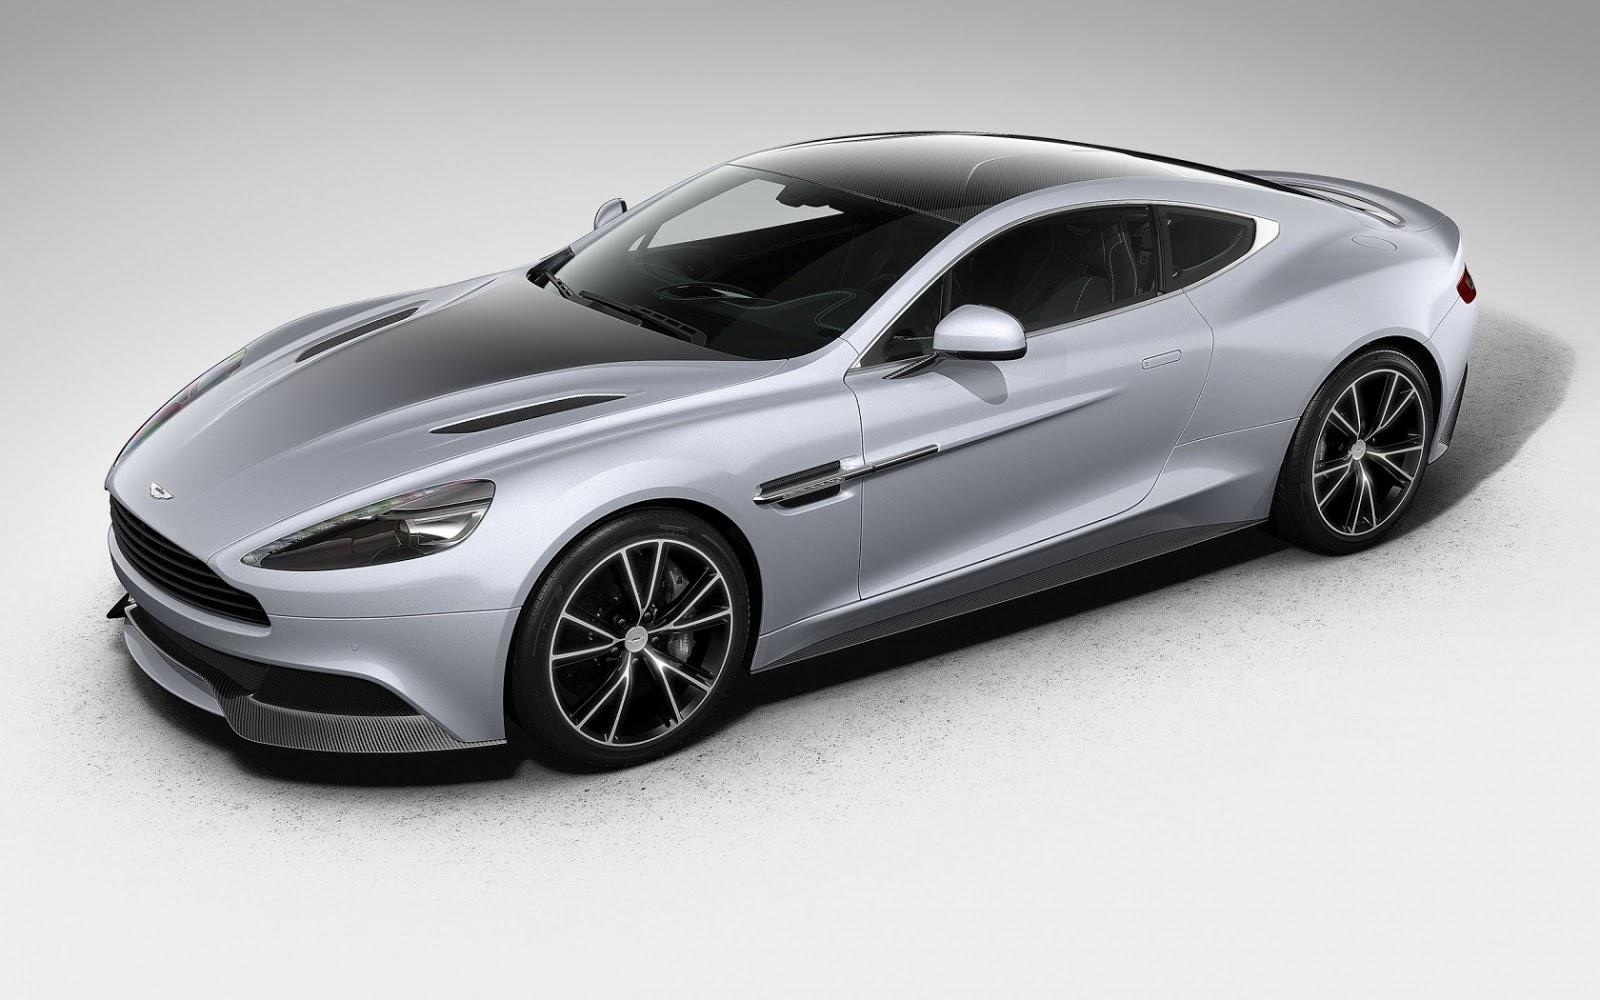 Artikel Terkait HD Wallpaper of Aston Martin DB9 Coupe 1600x1000